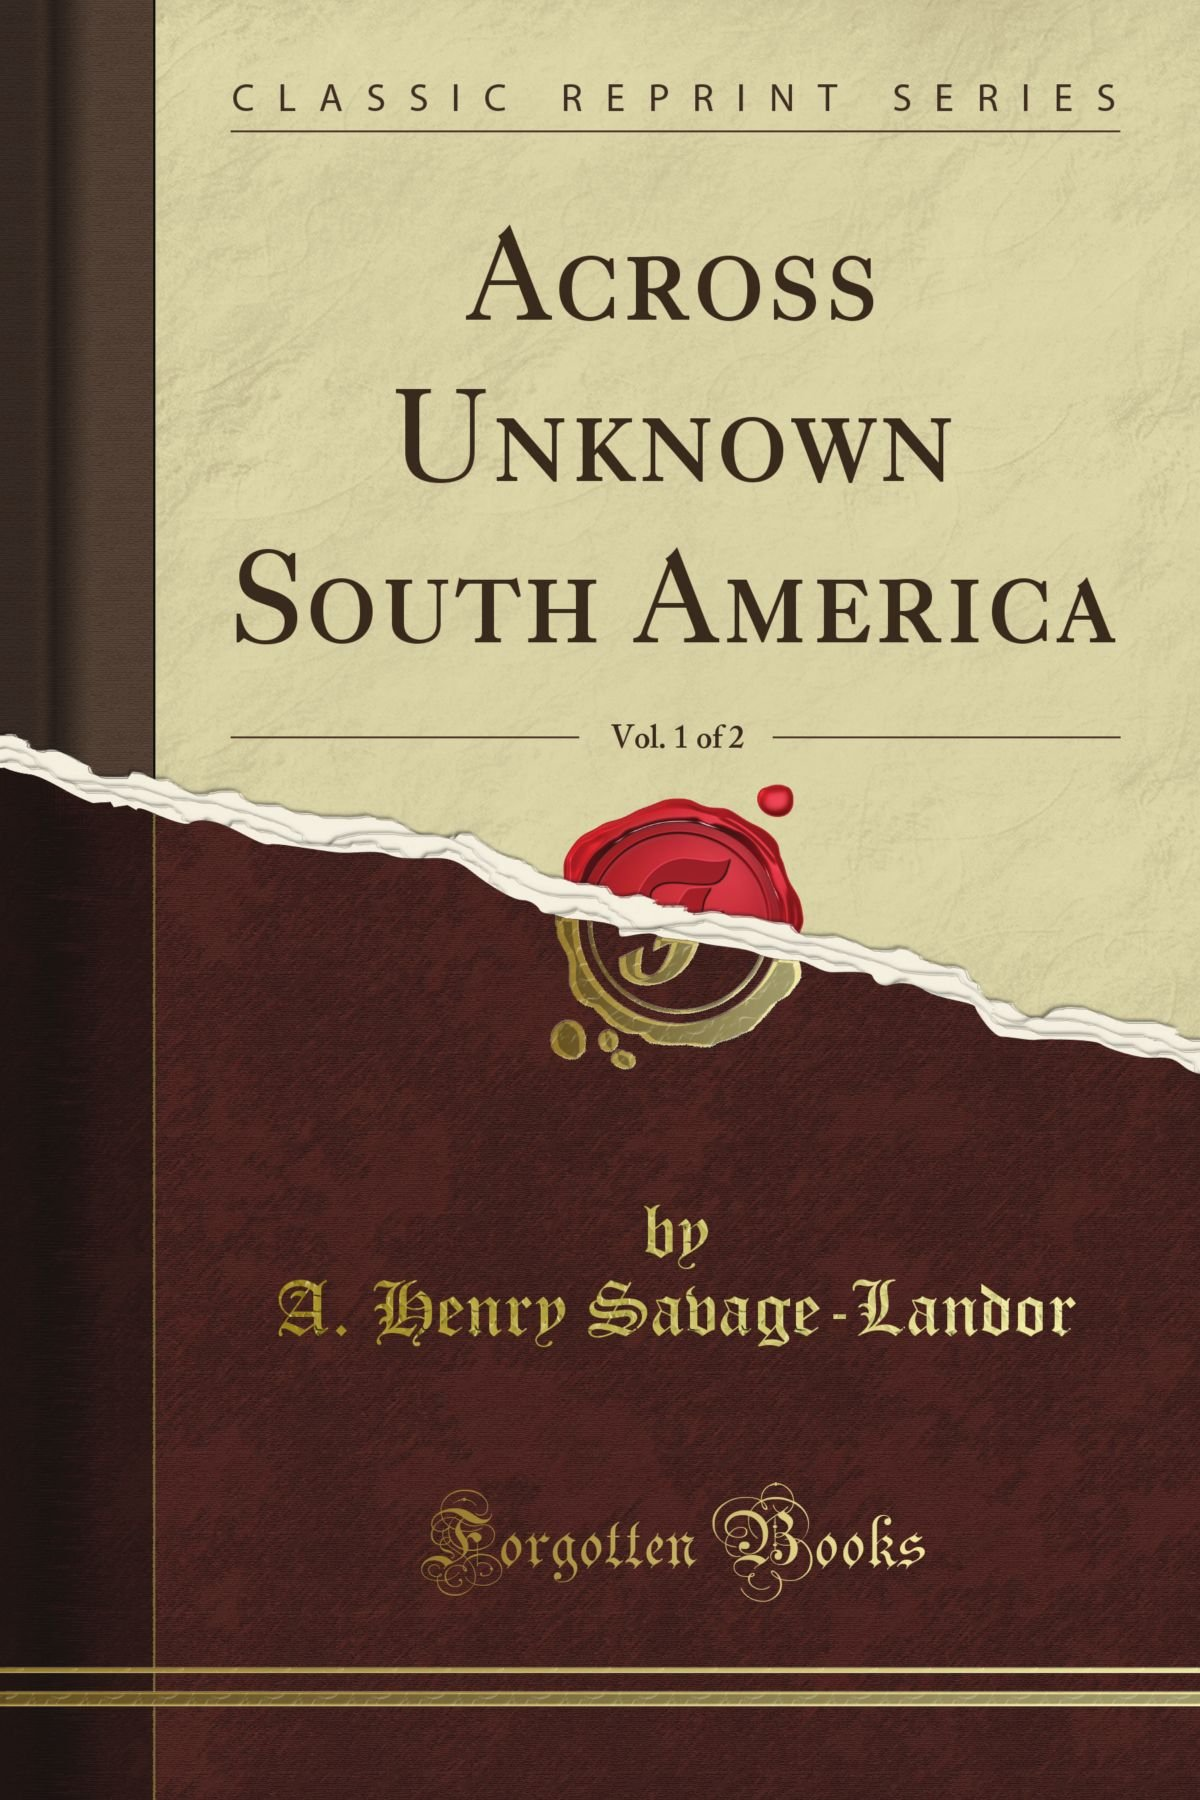 Across Unknown South America, Vol. 1 (Classic Reprint) ebook